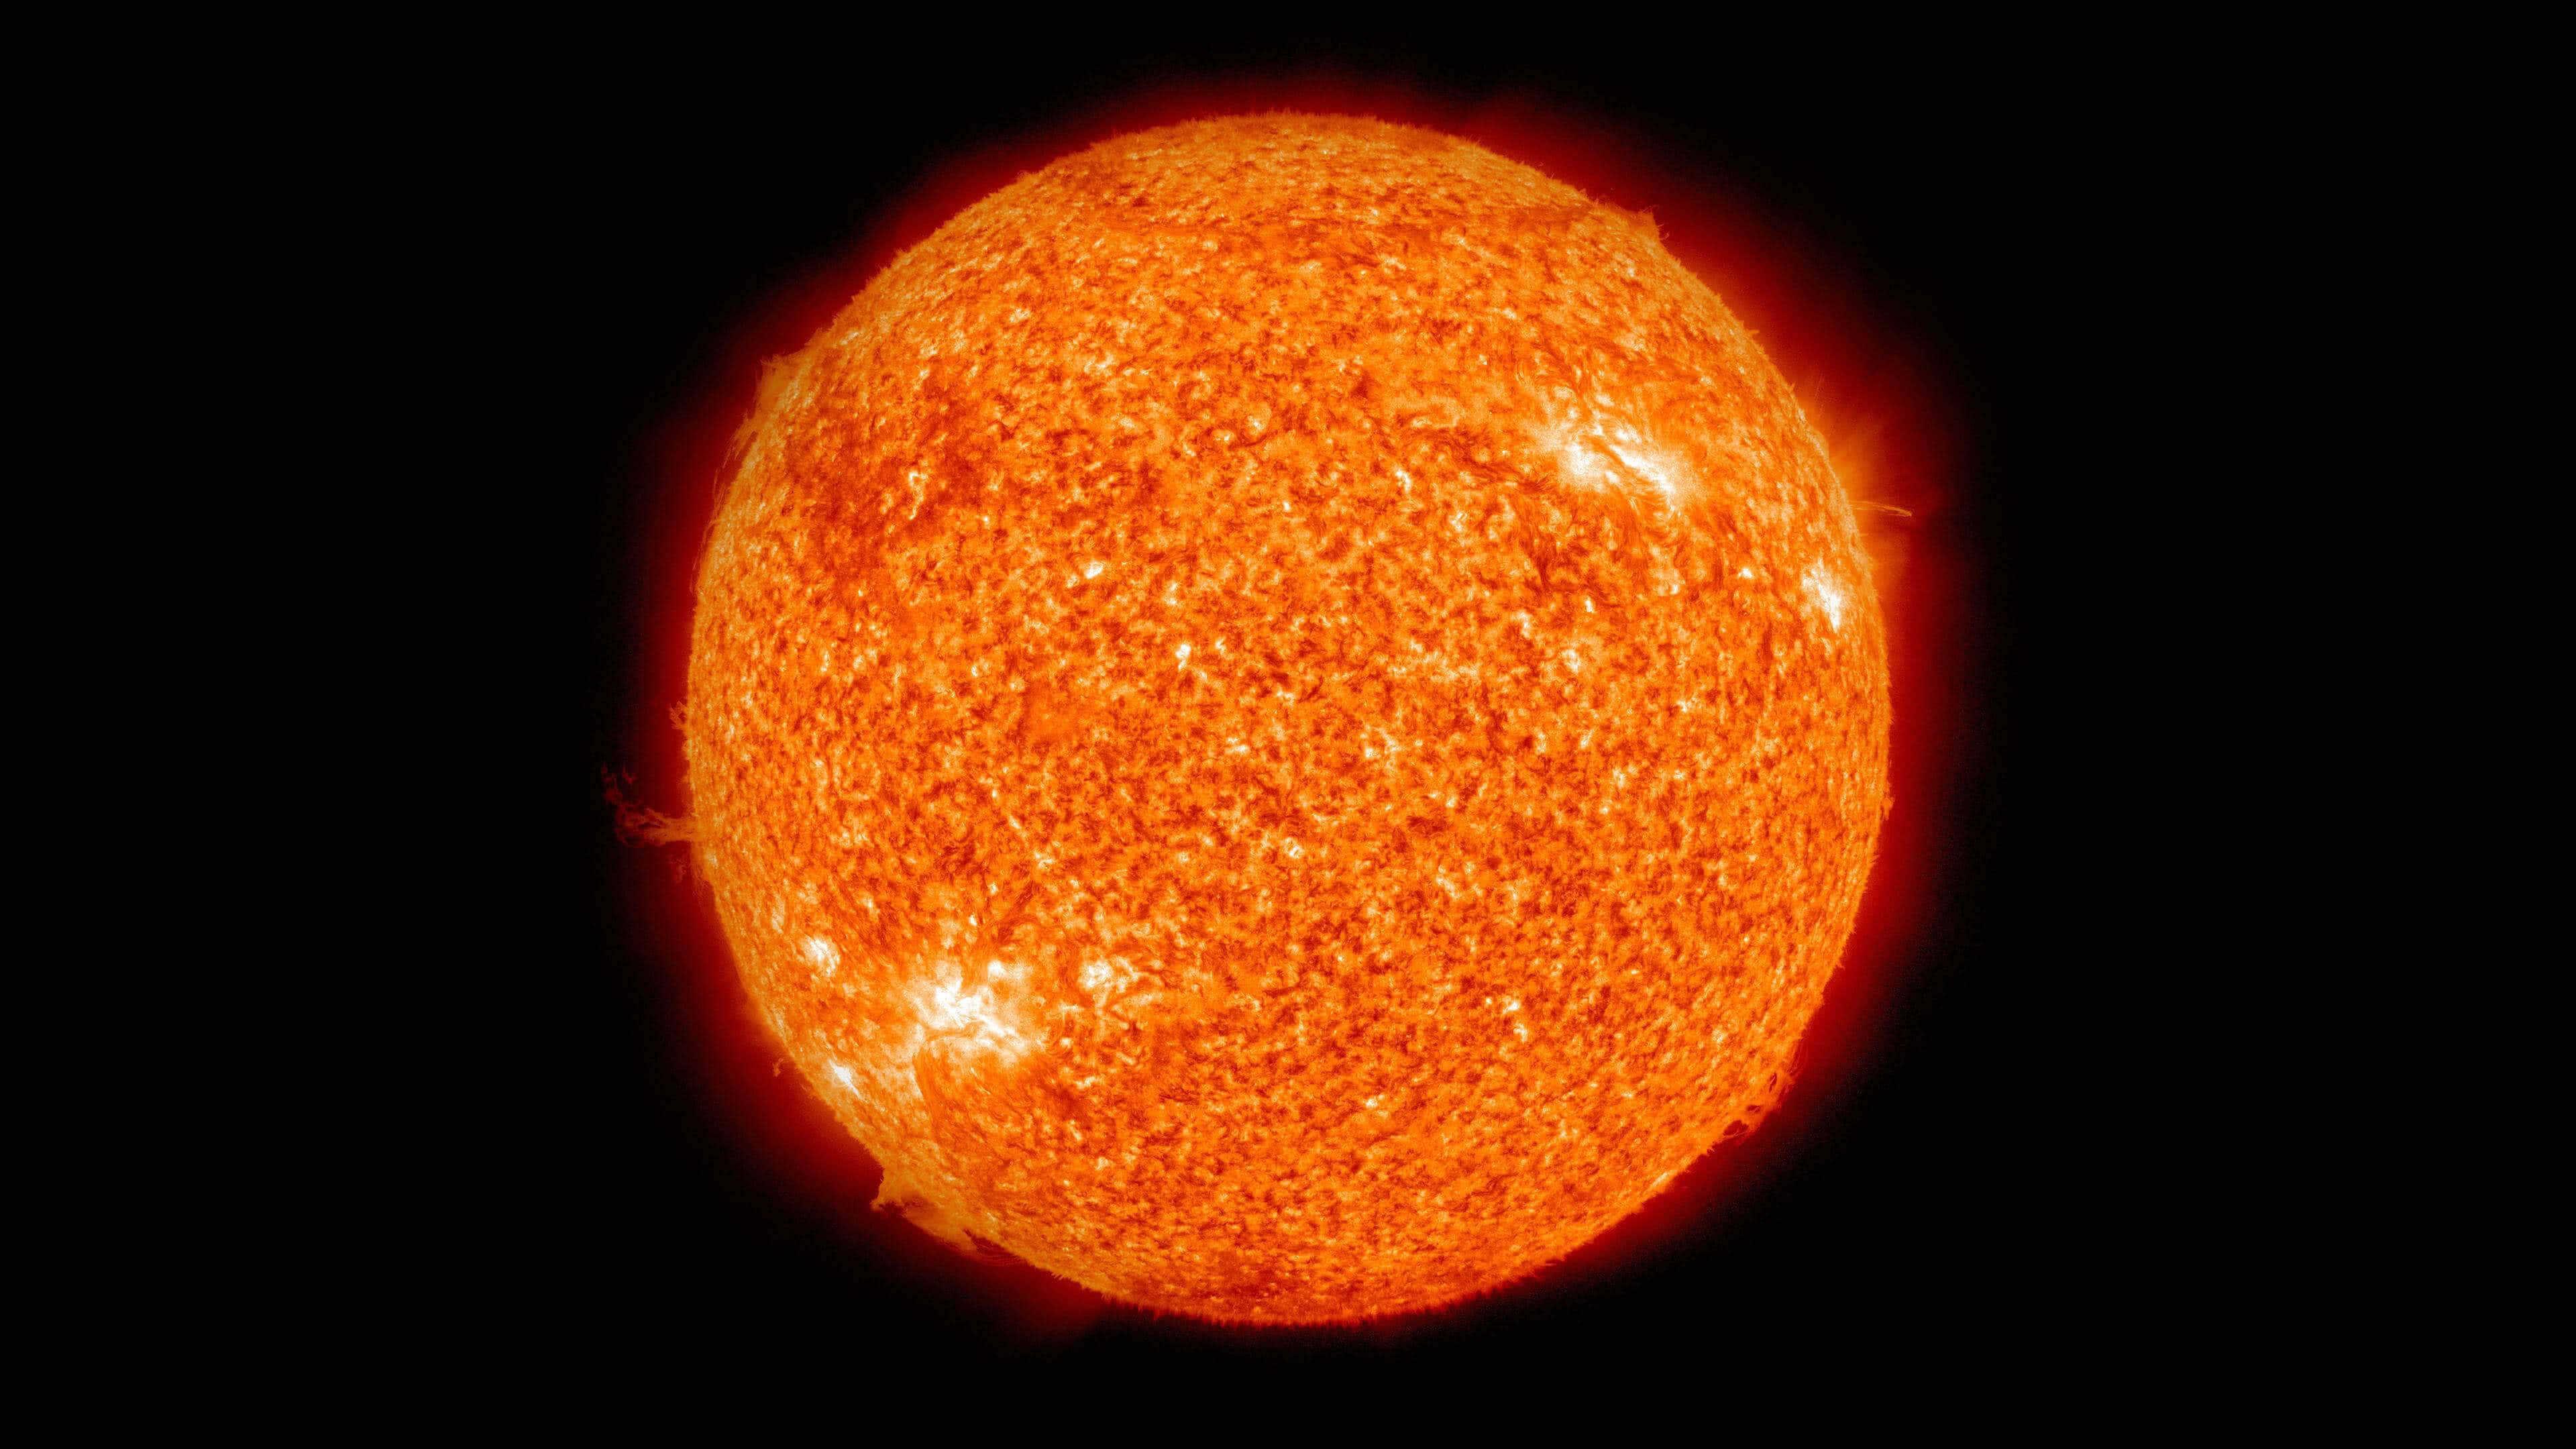 surface of the sun uhd 4k wallpaper